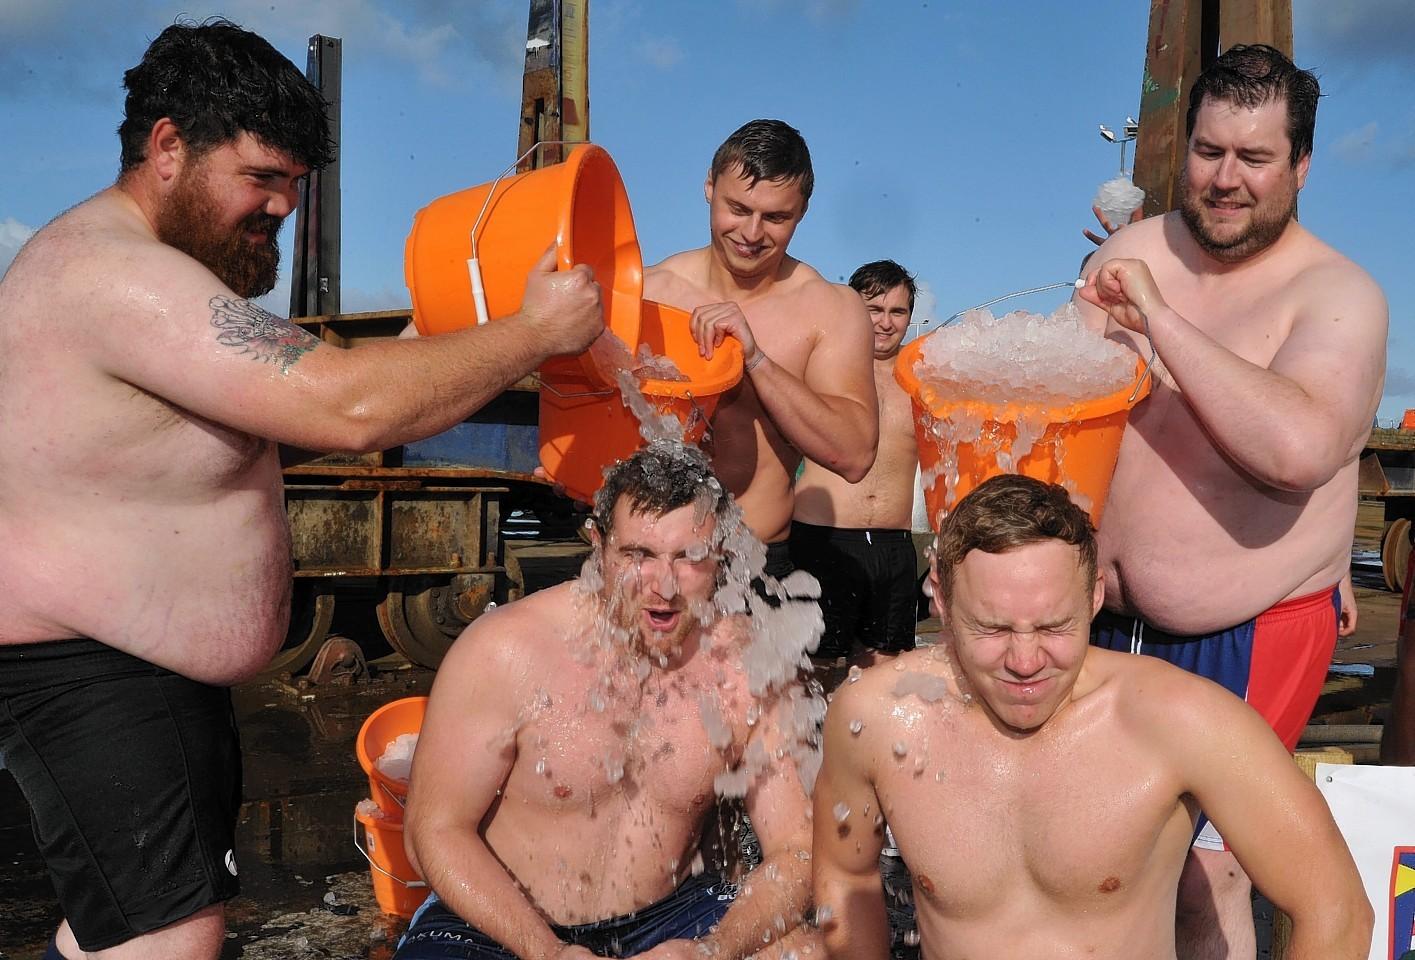 Peterhead rugby team do the ice bucket challenge